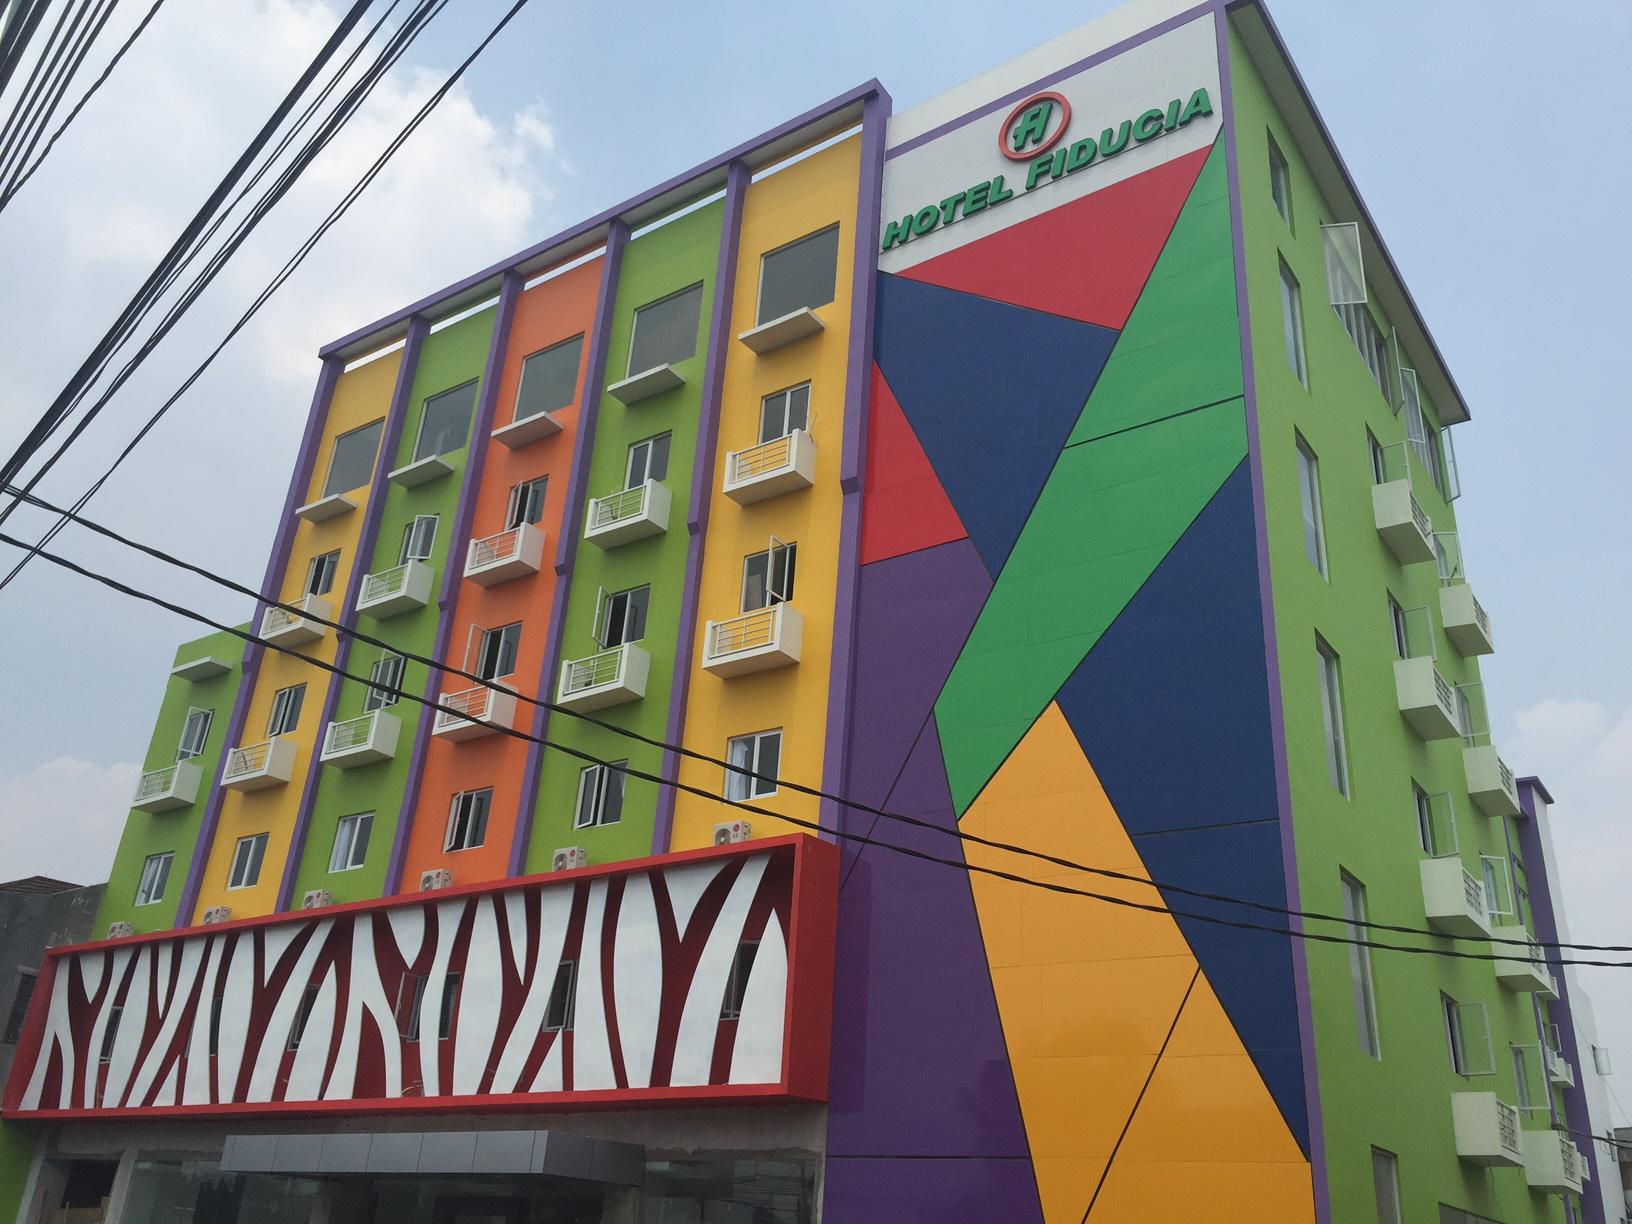 hotel fiducia rh hotelfiducia com